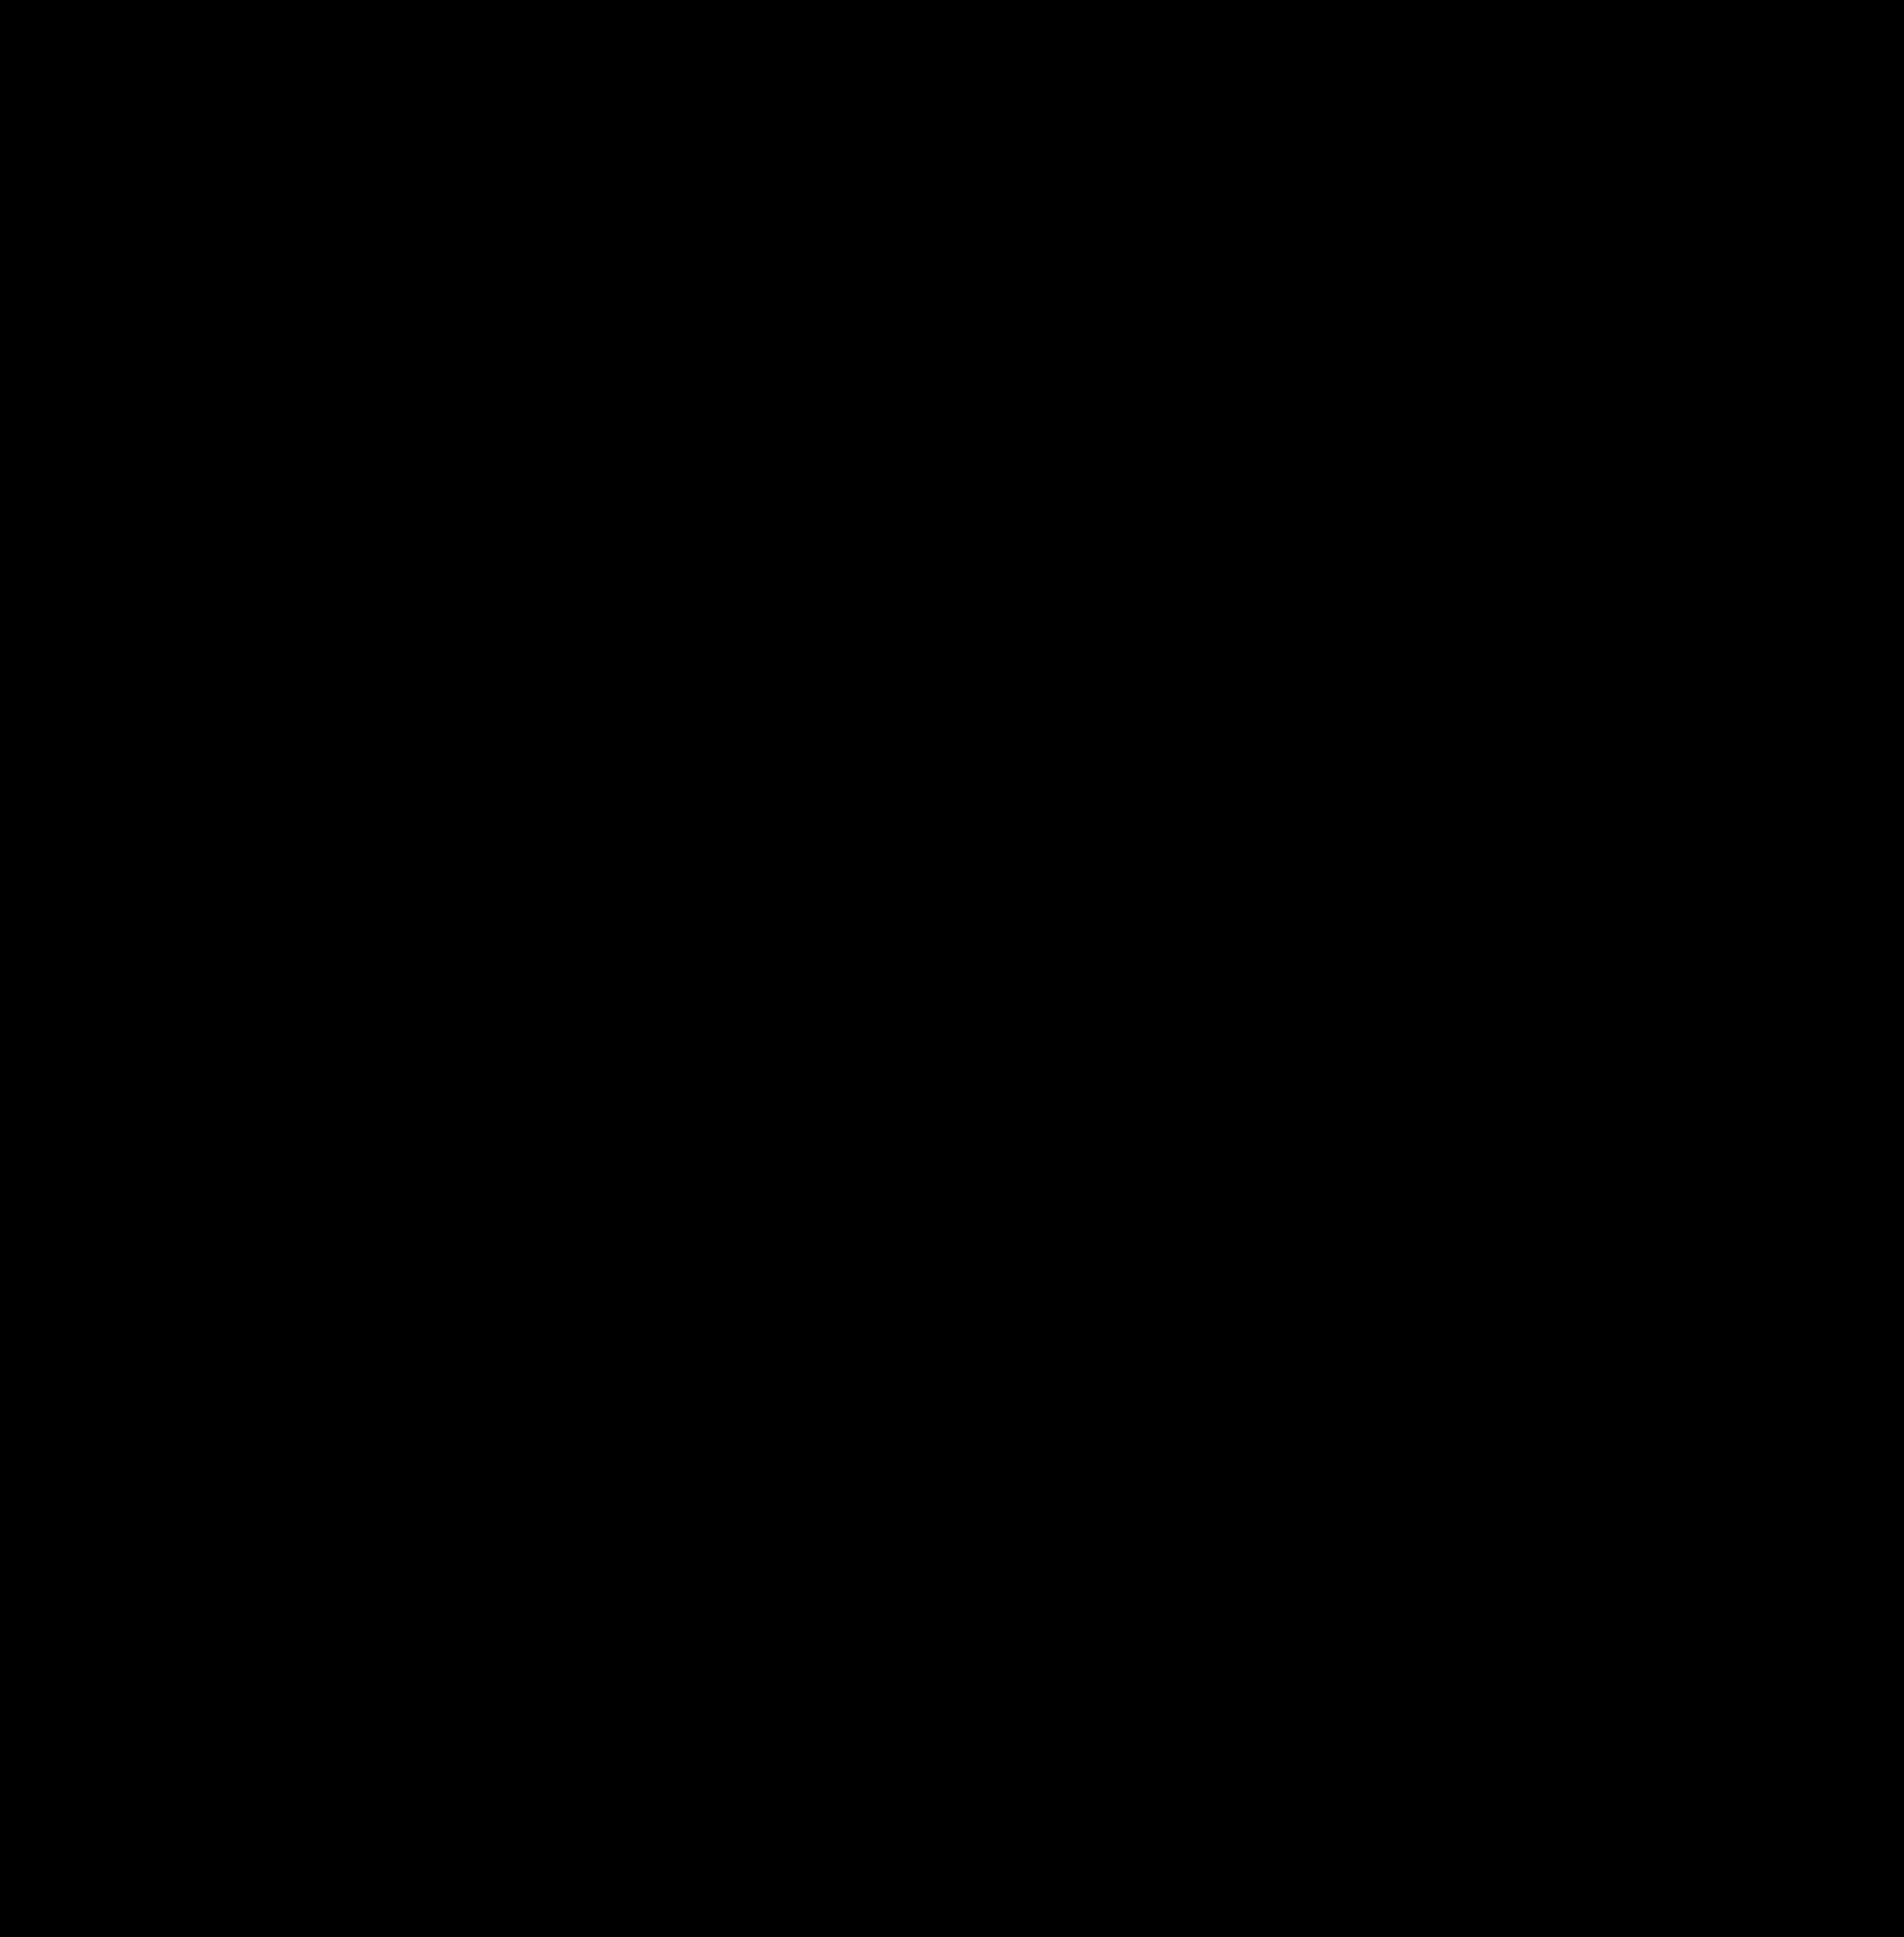 Tadalafil – Inhaltsstoff von Levitra